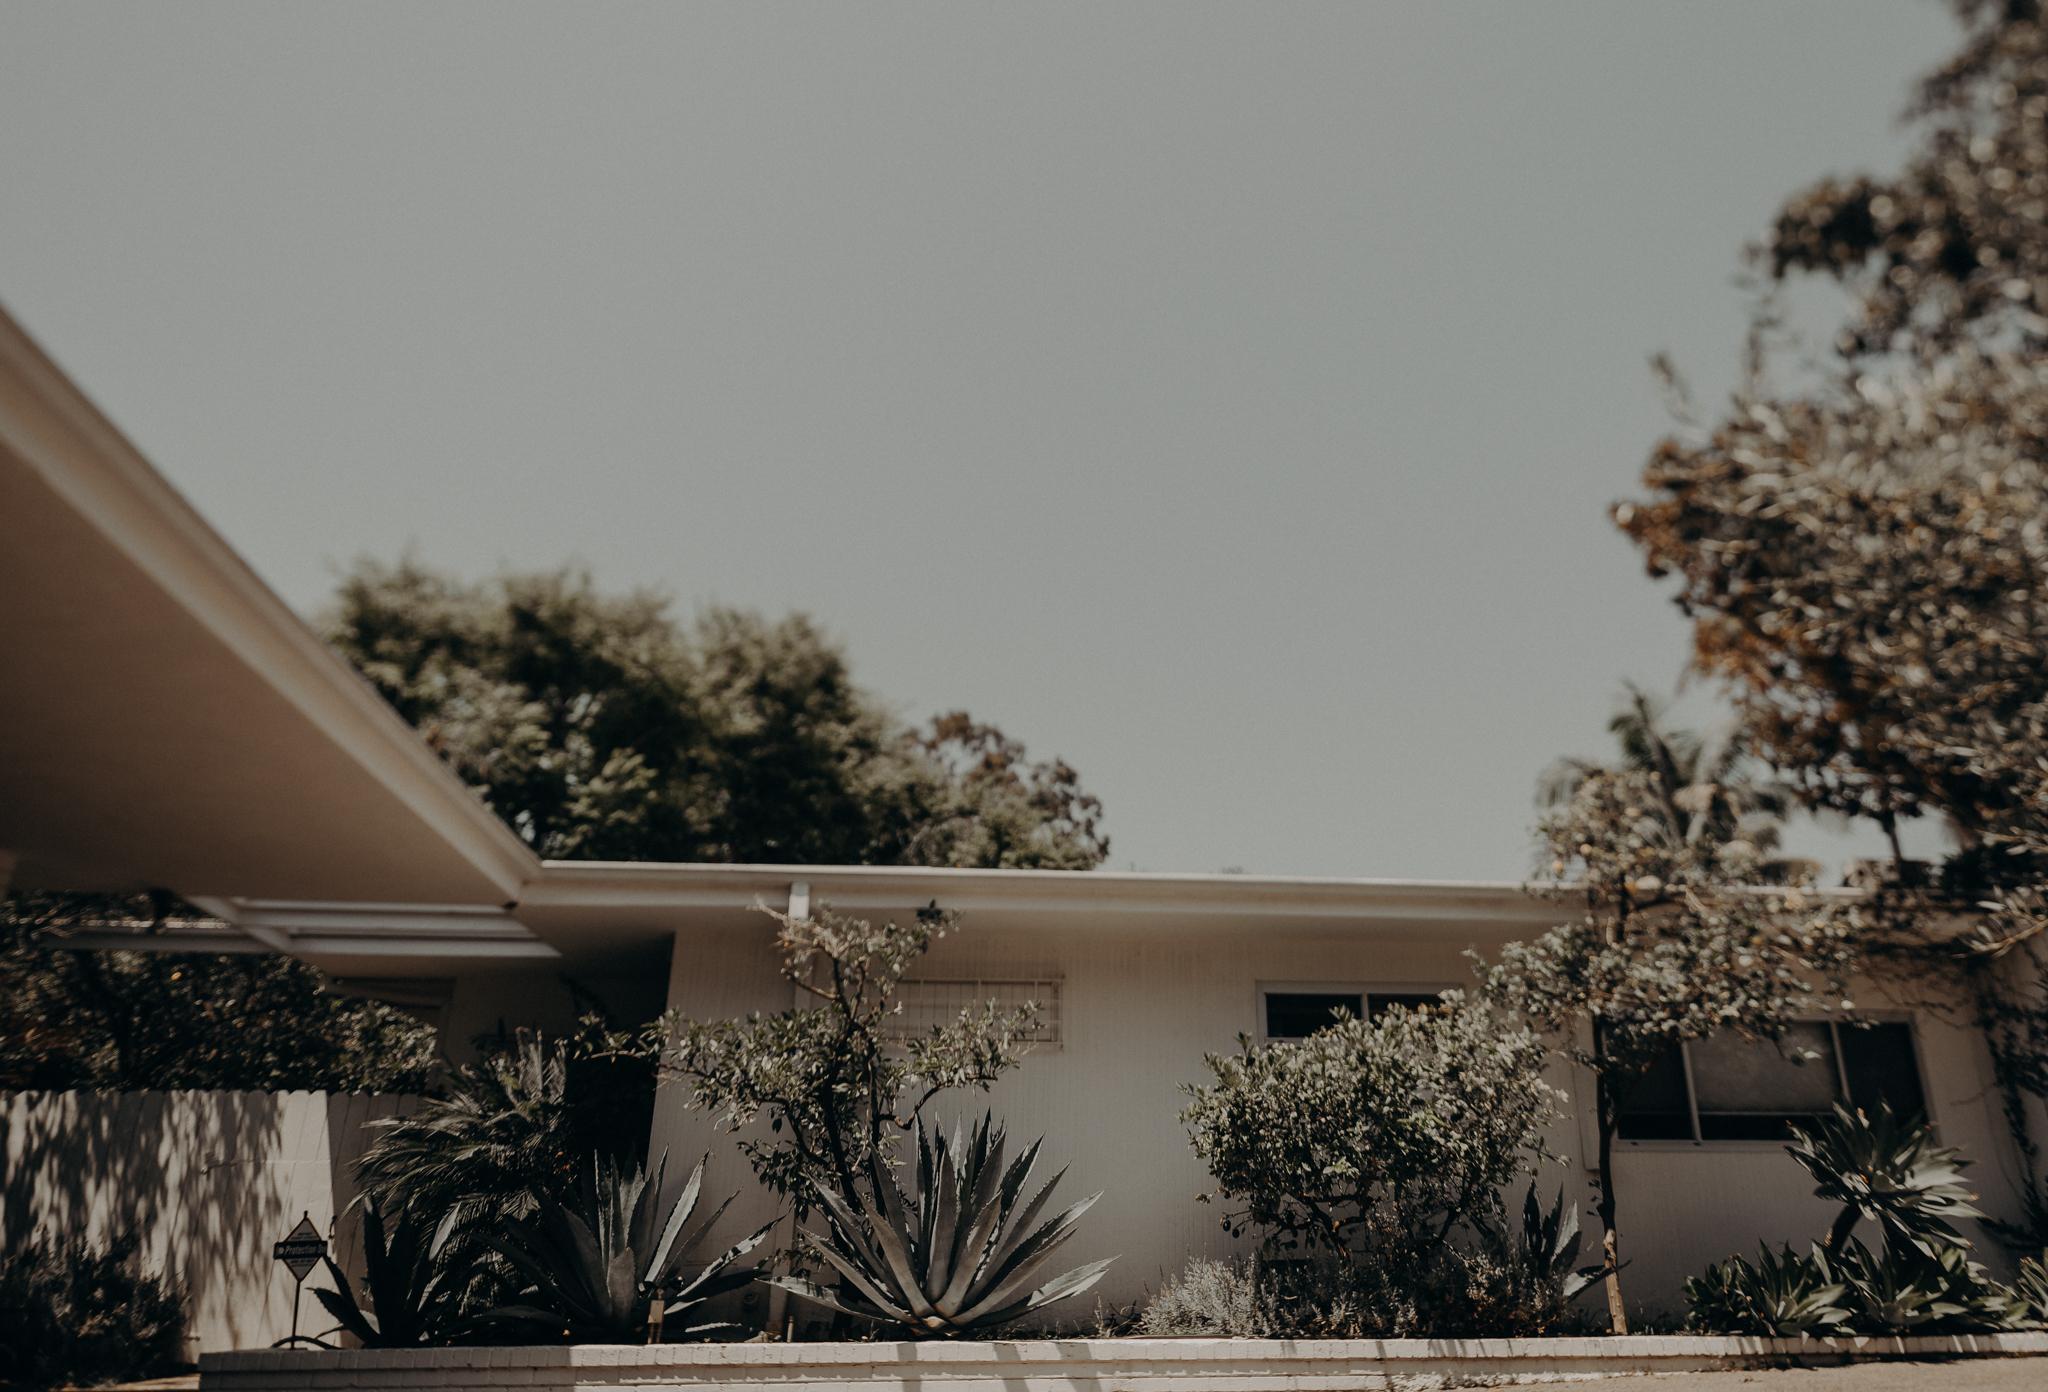 Isaiah + Taylor Photography - Private Estate Backyard Wedding - Beverly Hills - Los Angeles Wedding Photographer - 01.jpg